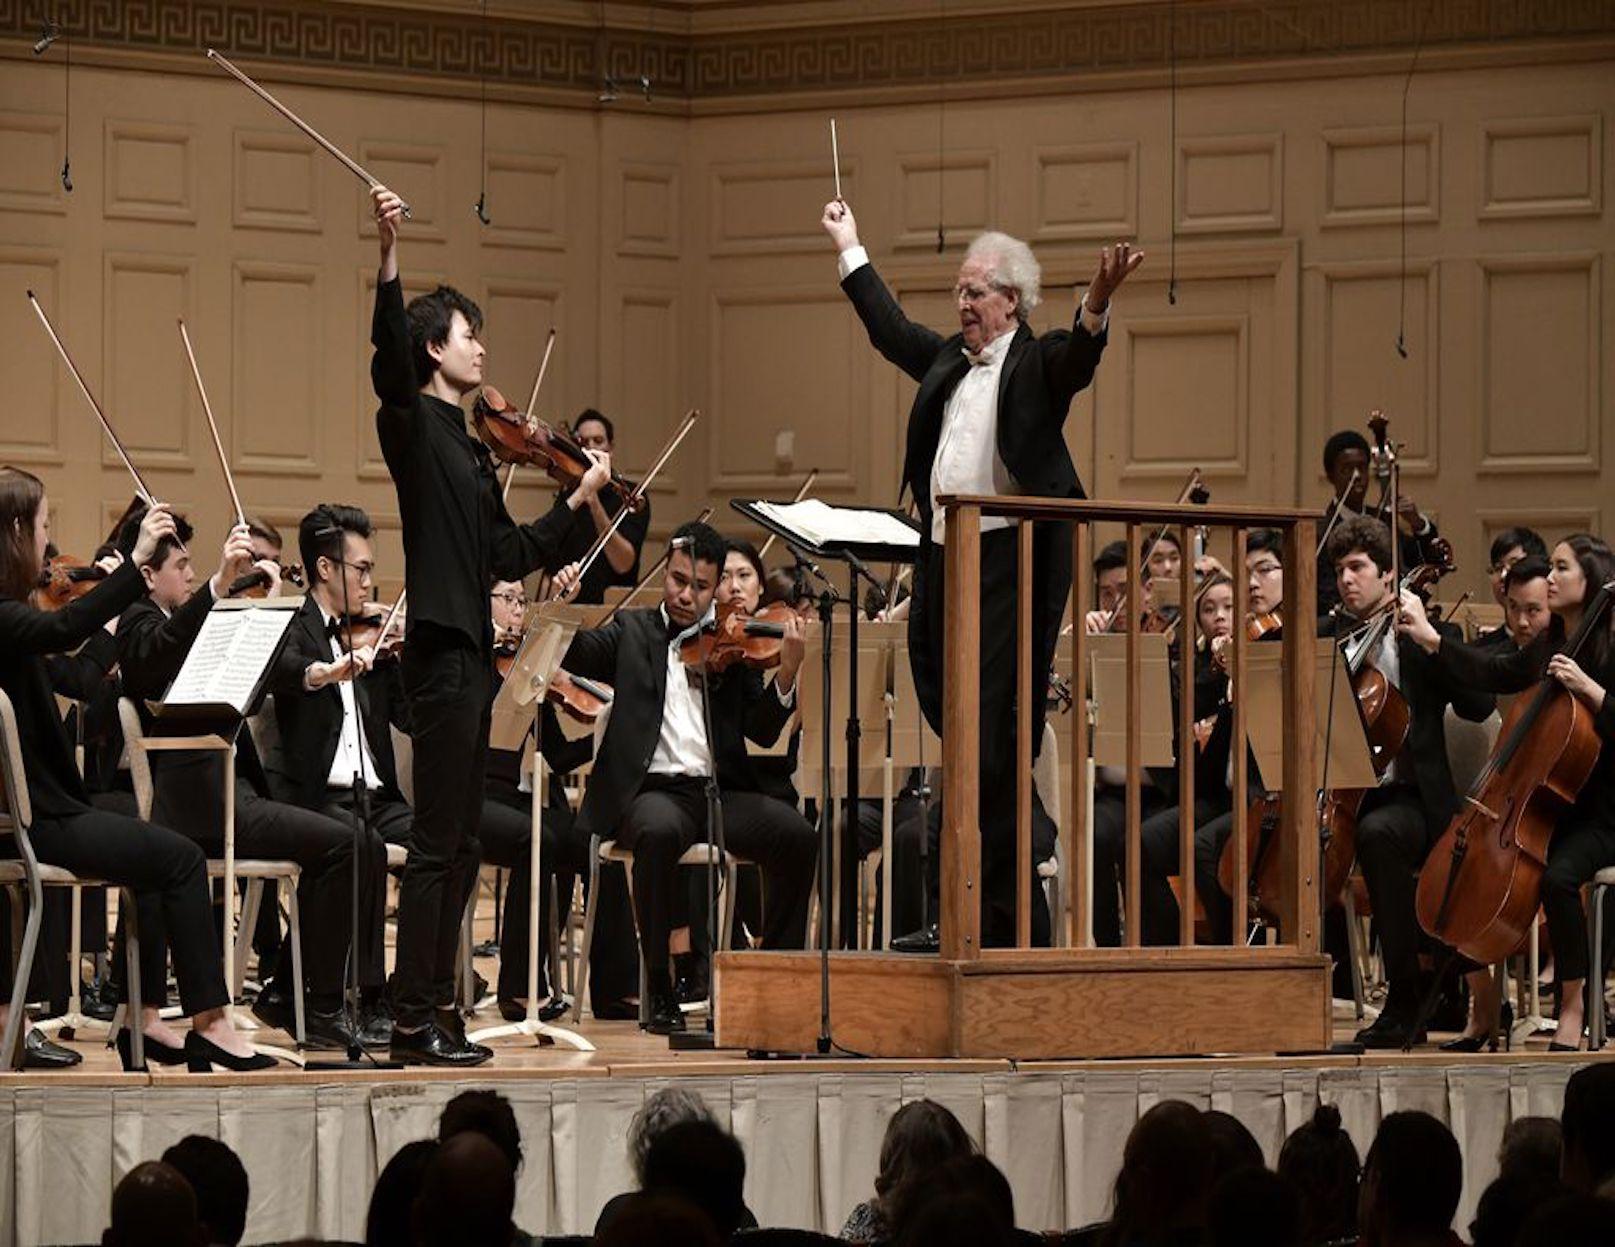 Stefan Jackiw and Benjamin Zander return to the Mendelssohn Concerto, 20 years later